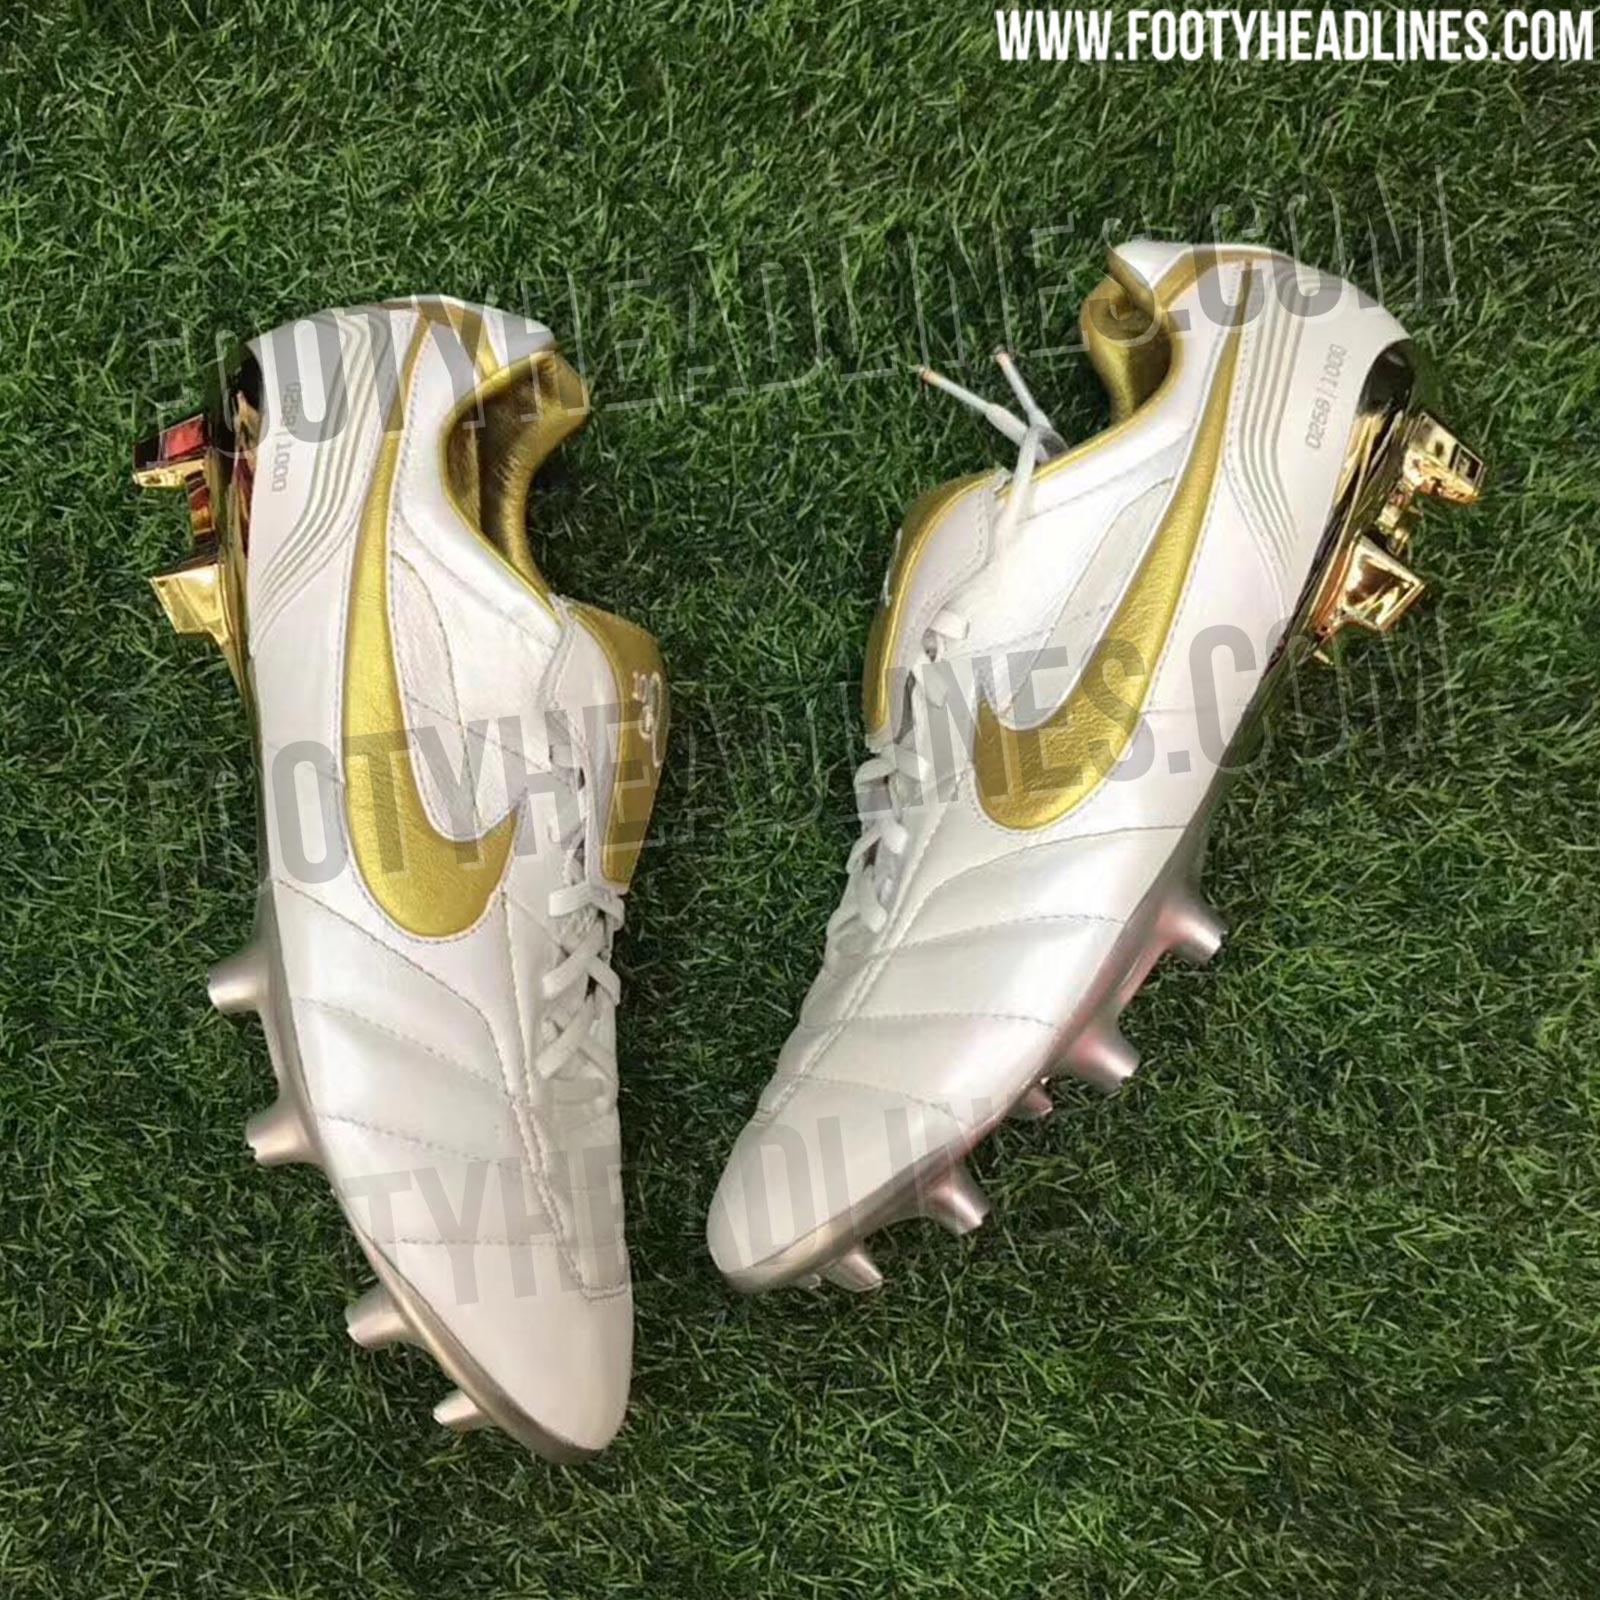 quality design 62cd3 b9a01 White / Gold Nike Tiempo Legend Ronaldinho 2018 Boots Leaked ...